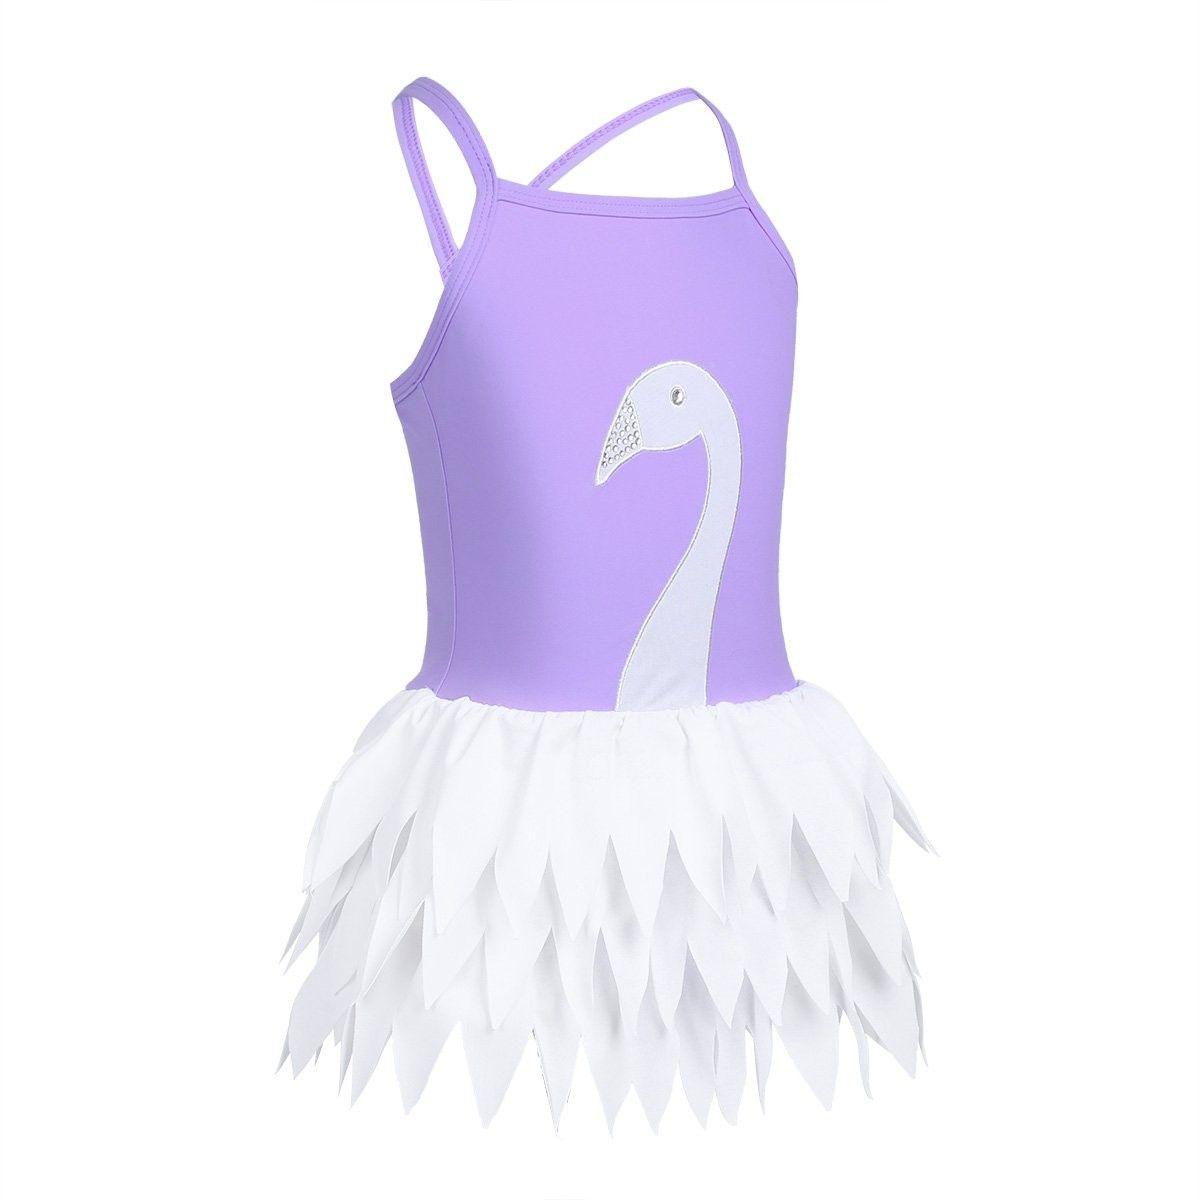 Freebily Little Big Girls Swan Flower Ruffles Tutu Ballet Leotard Dress One-Piece Swimsuit Camisole Bathing Suit